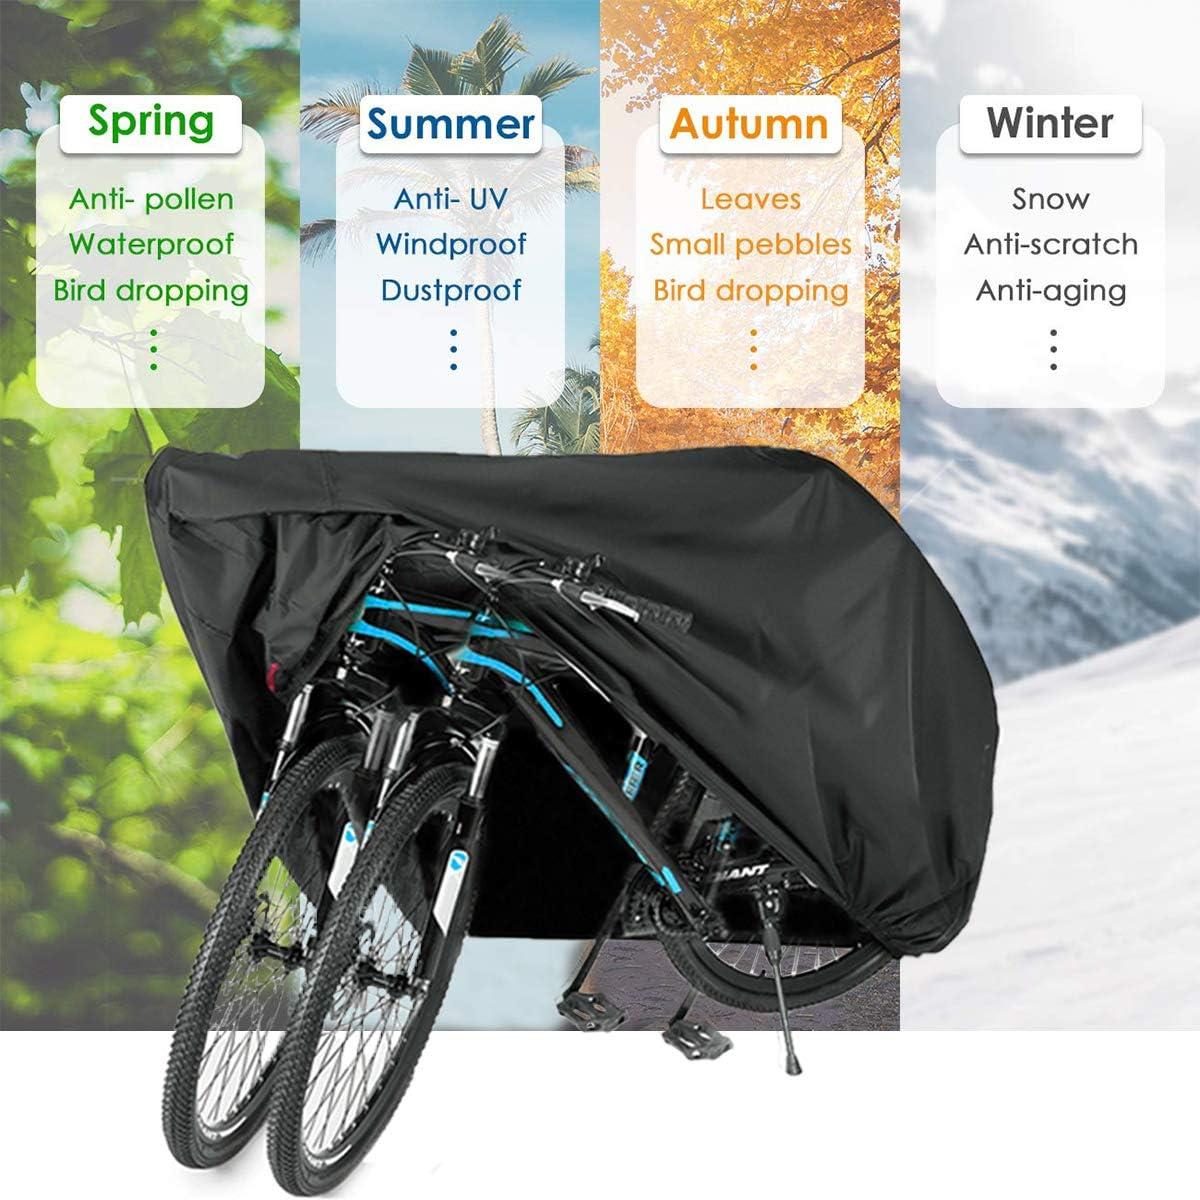 Universal Waterproof Bicycle Bike Cover Rain Resistant Sun Protection for 2 B8C6